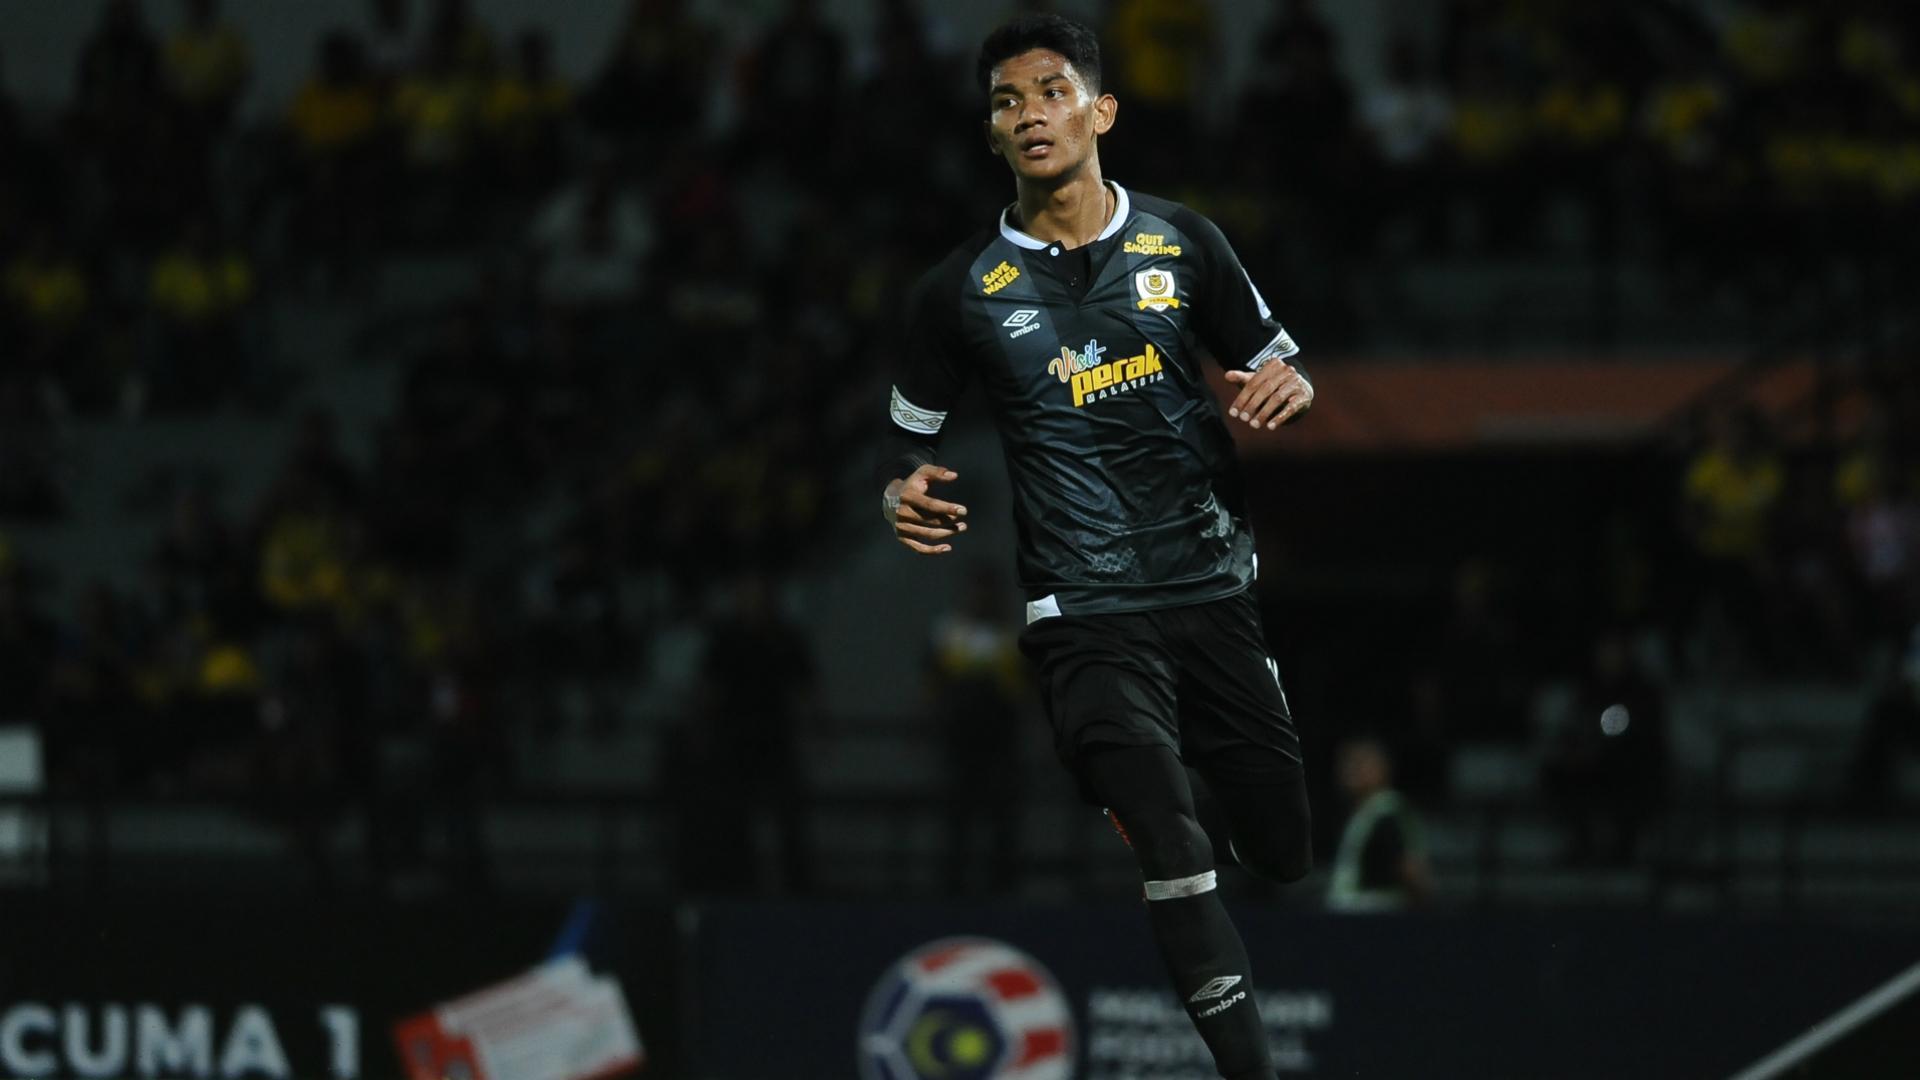 Shahrel Fikri, PJ City FC v Perak, Malaysia Super League, 14 Jun 2019